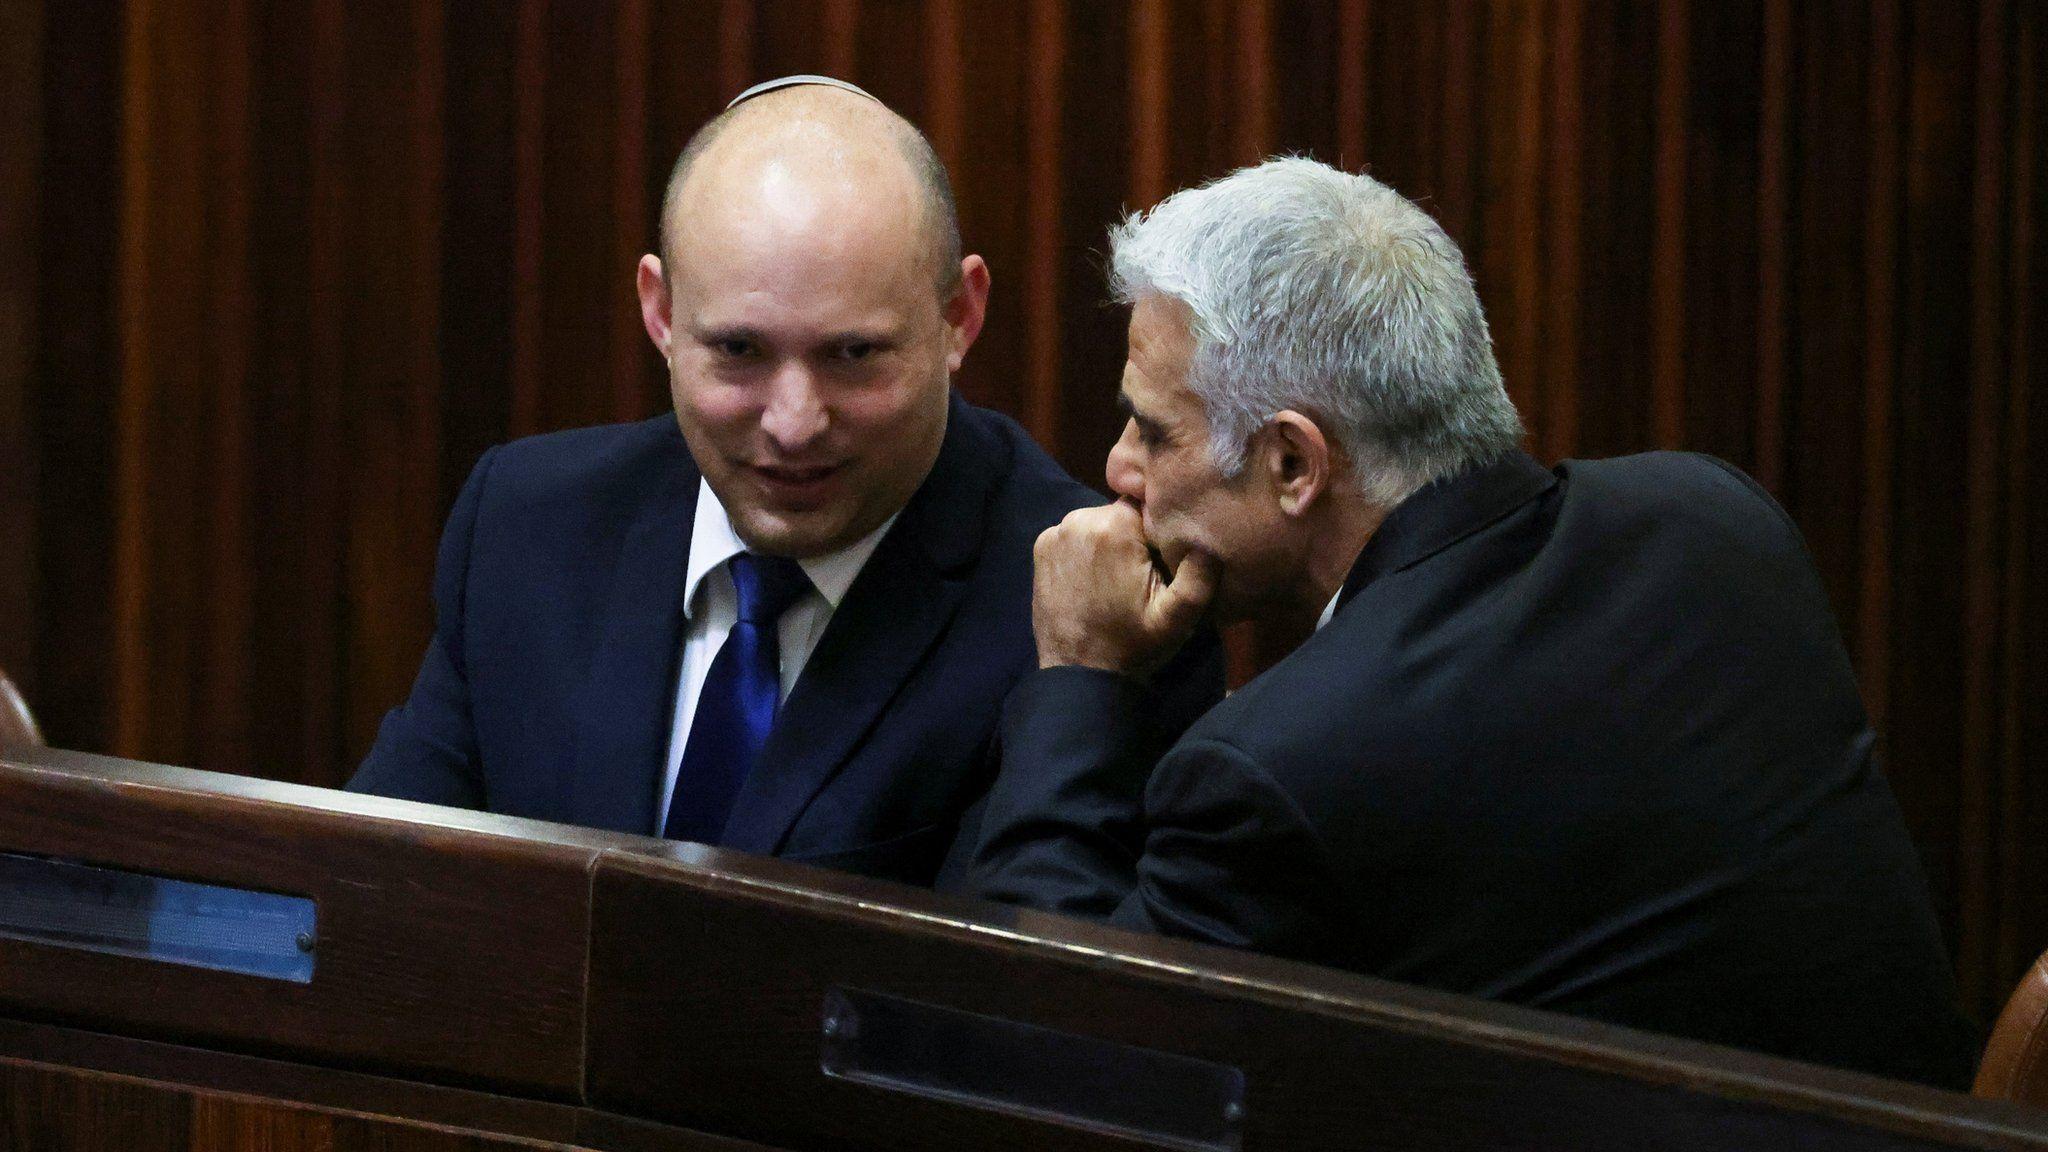 Israeli politicians Naftali Bennett (L) and Yair Lapid (R) talk during a parliamentary session in Jerusalem (2 June 2021)